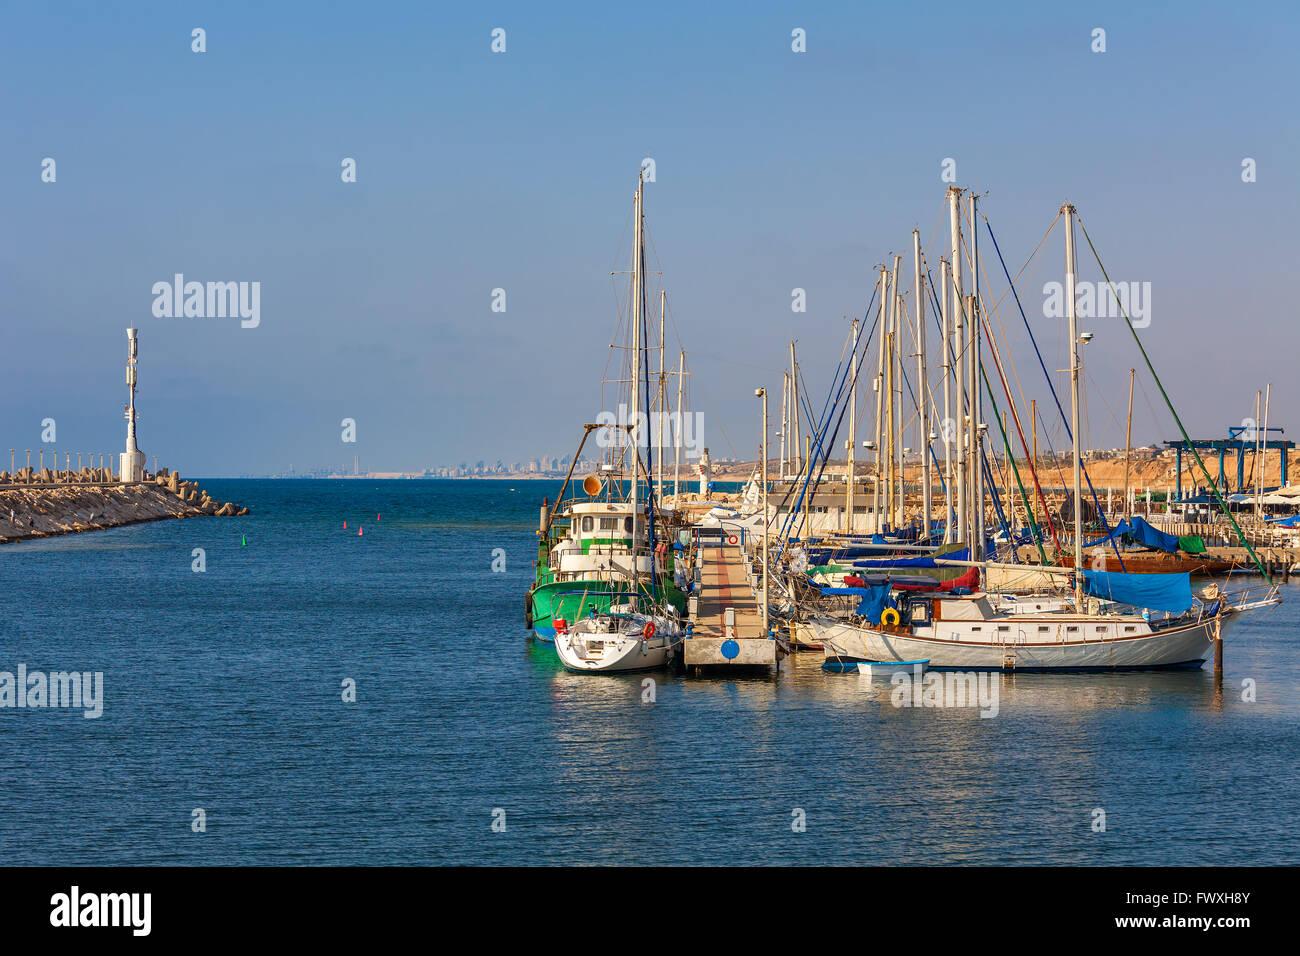 Yachts on marina in Ashqelon - coastal city on Mediterranean sea in Israel. - Stock Image